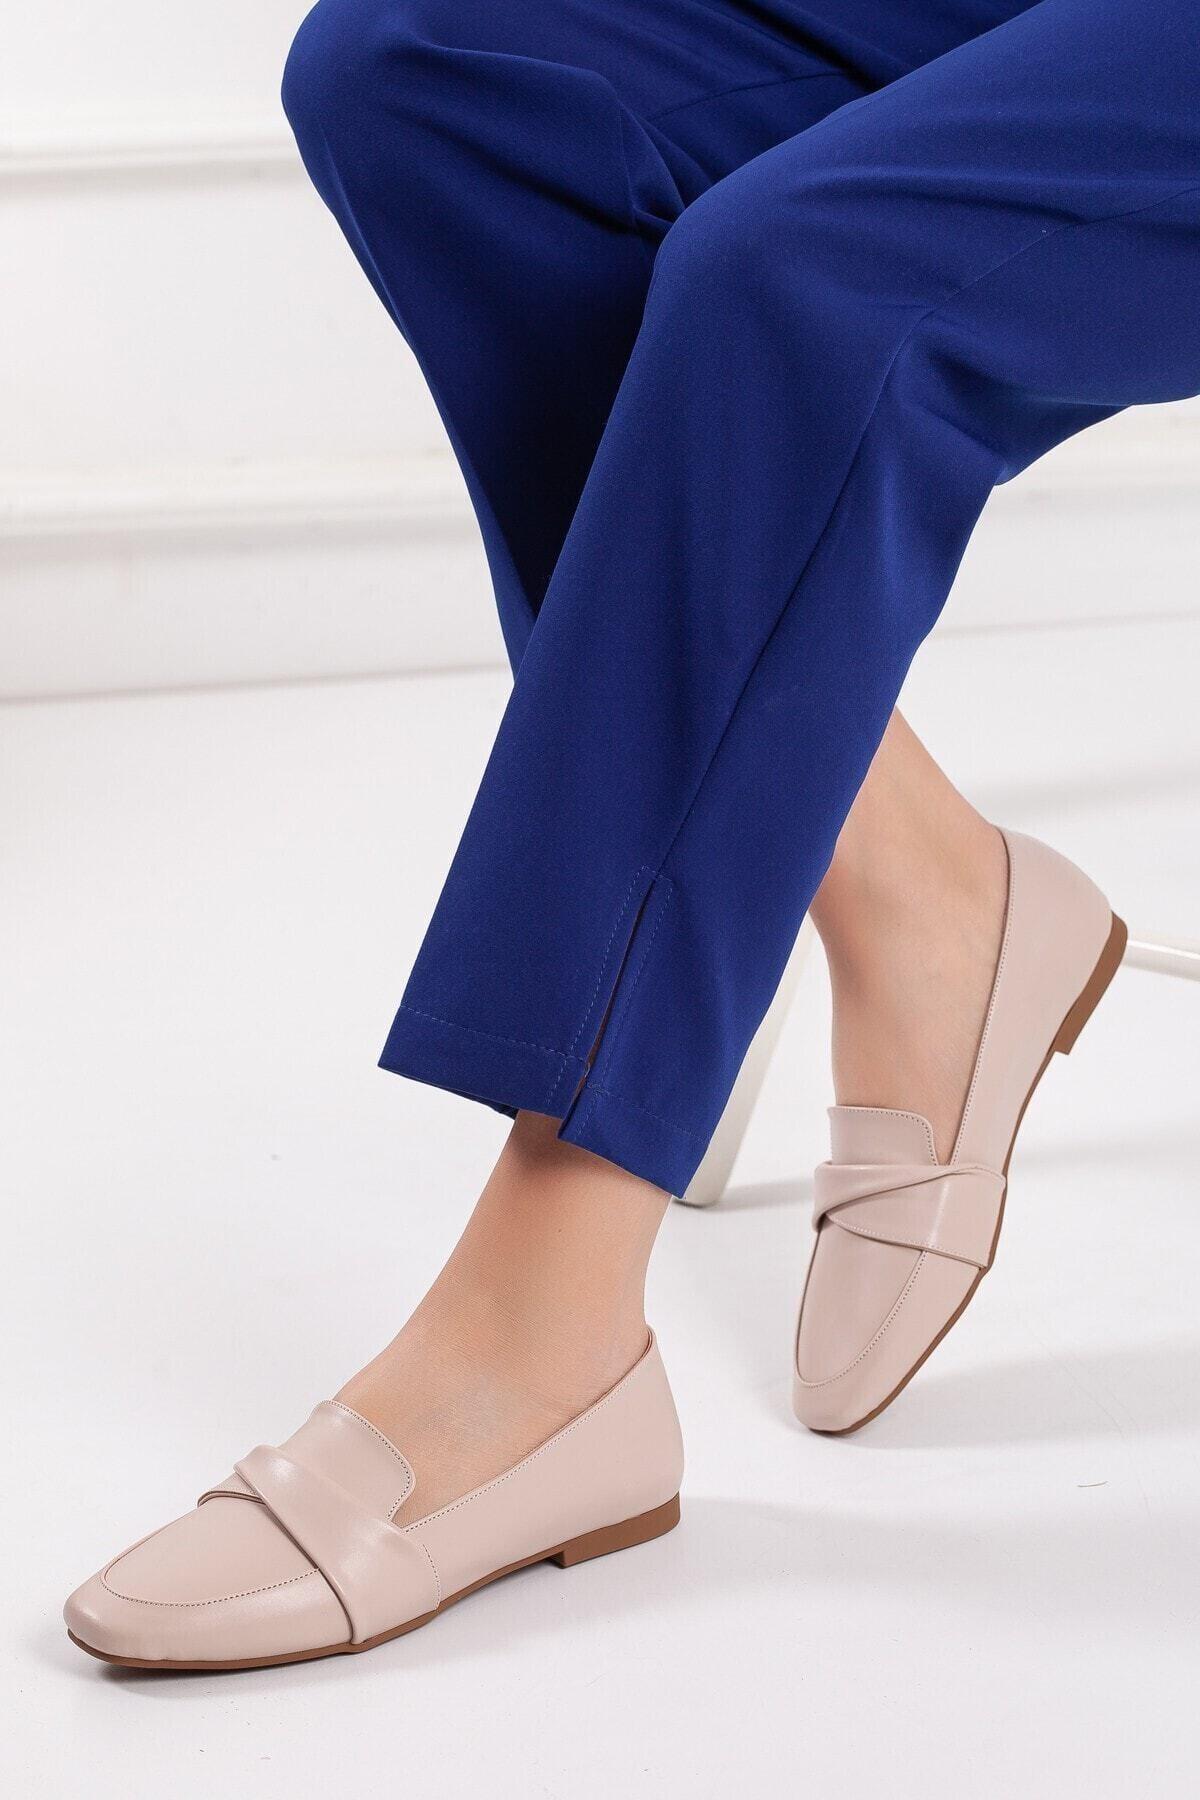 خرید اینترنتی کفش تخت خاص برند Zulu رنگ بژ کد ty106862046